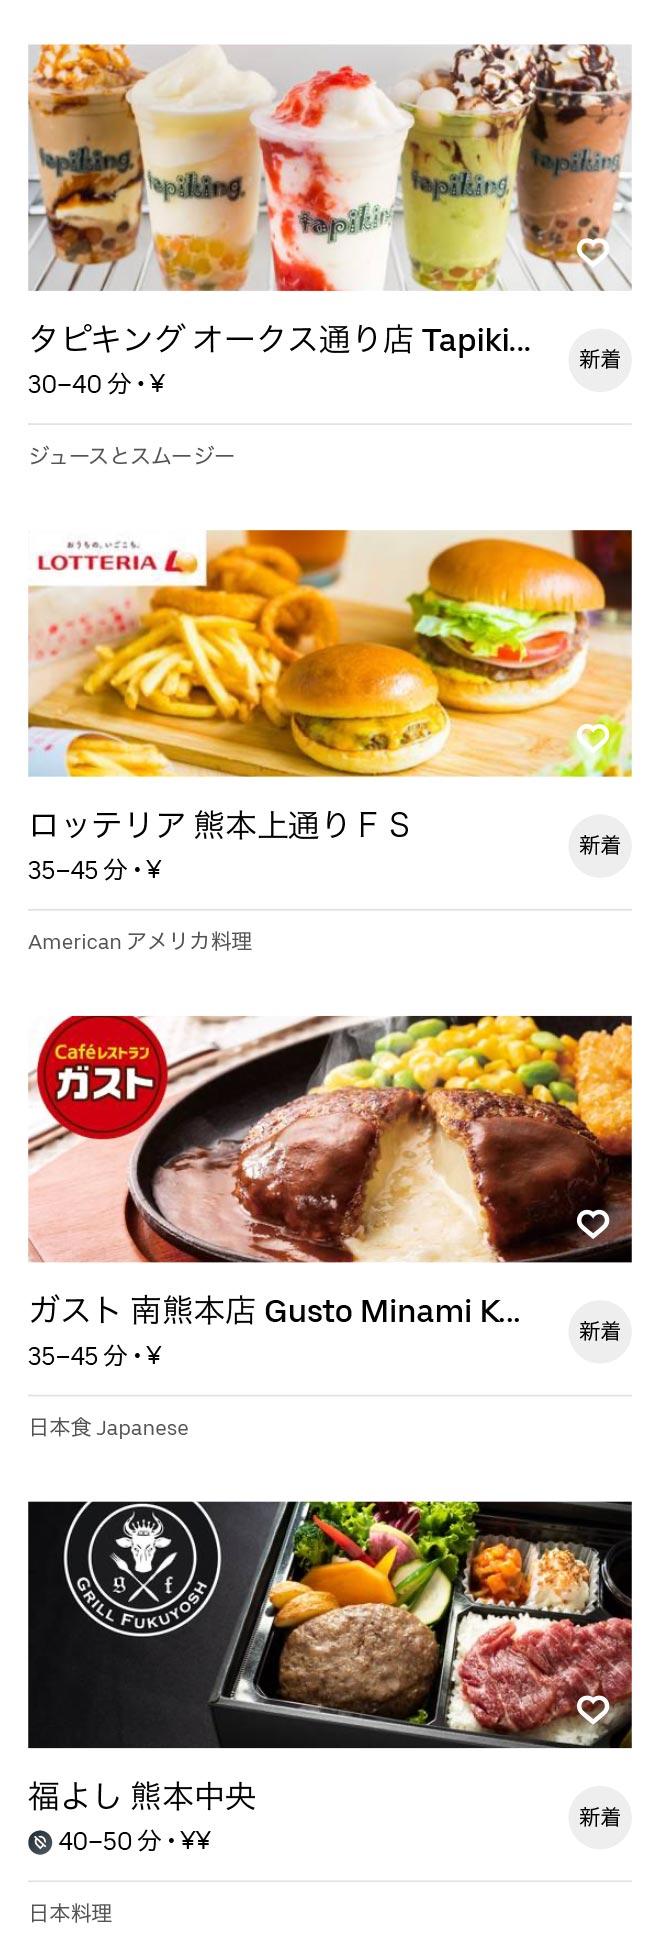 Kumamoto menu 2008 03